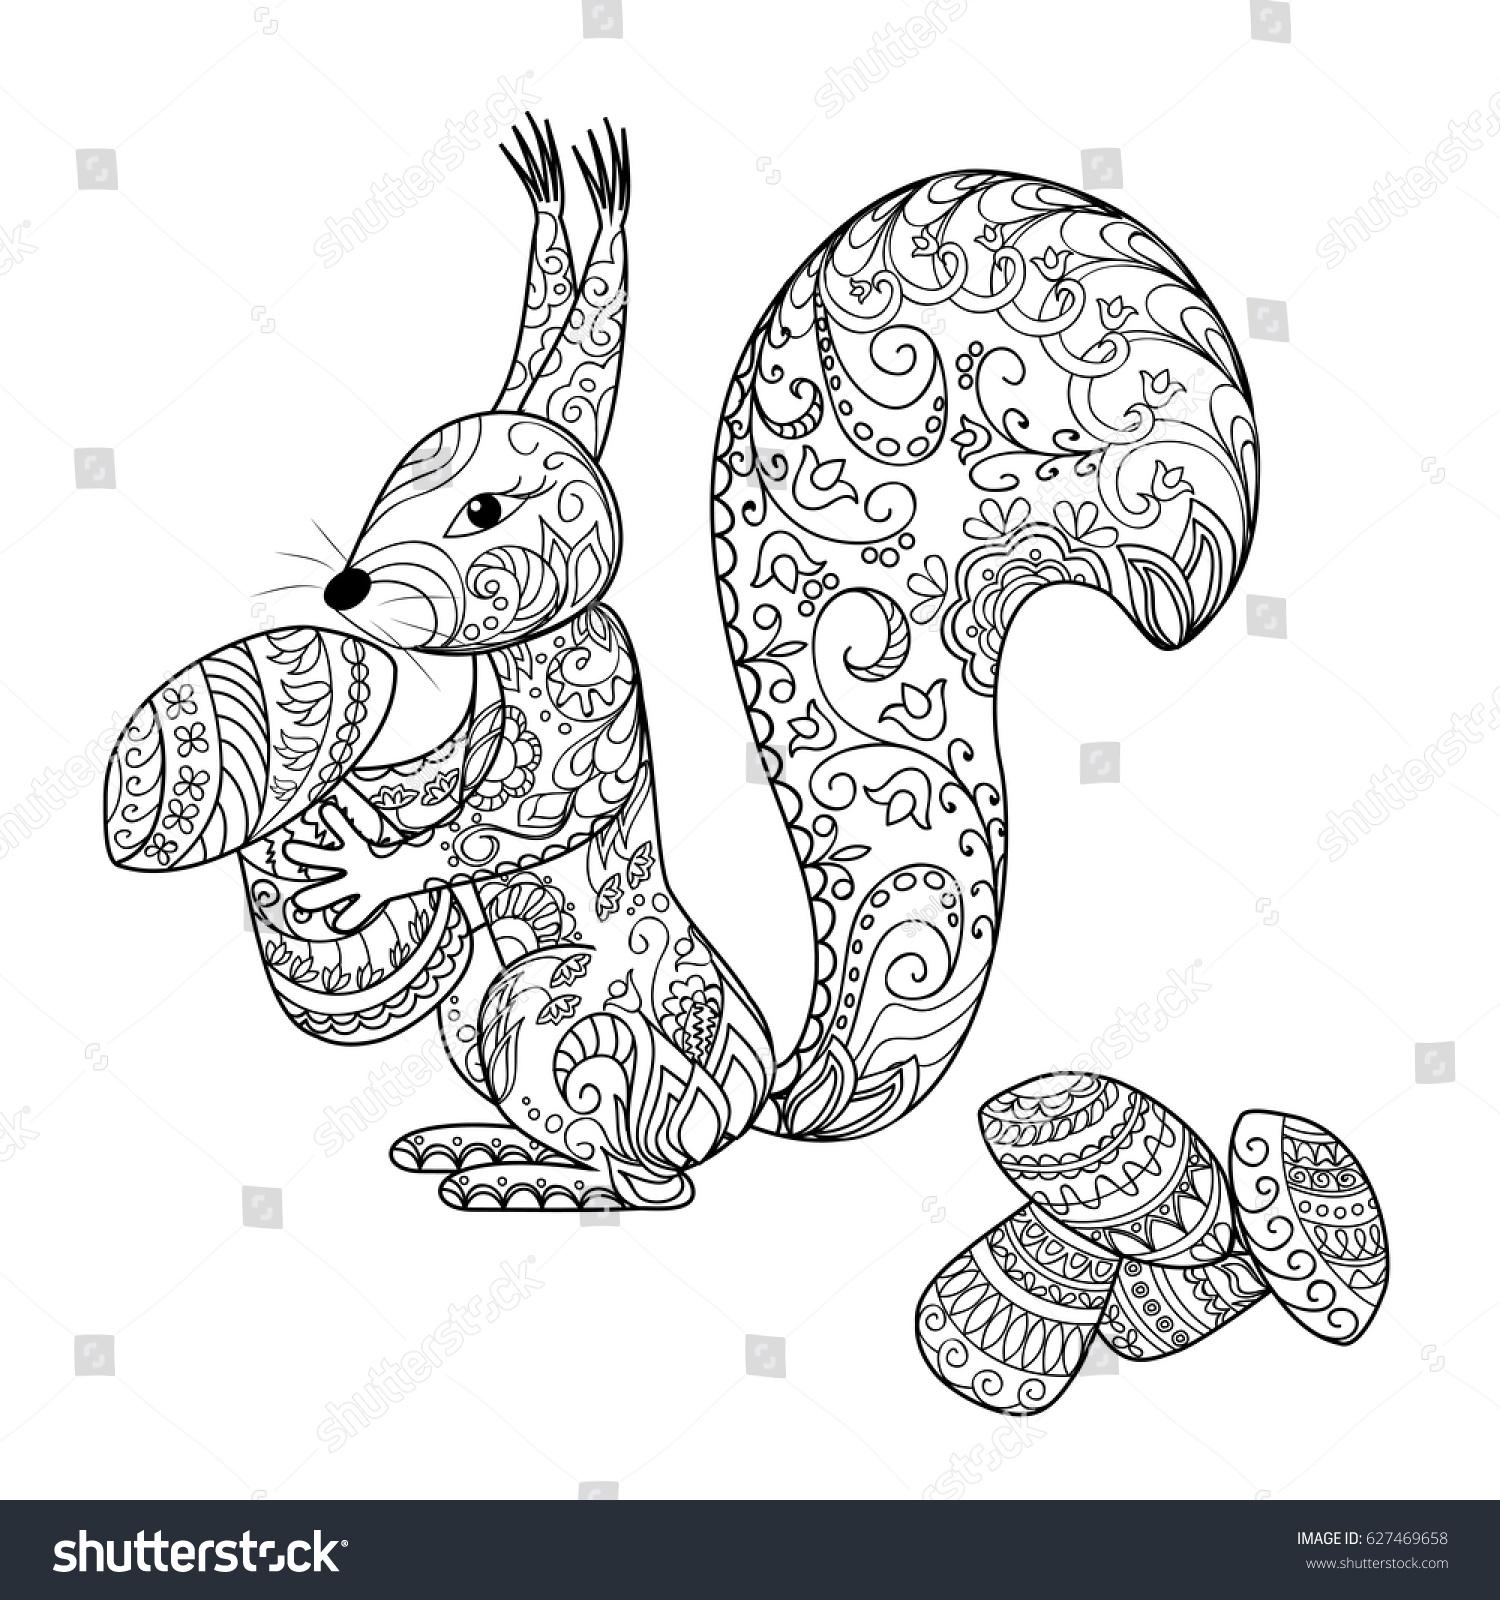 Hand Drawn Decorated Cartoon Squirrel With Mushrooms Zentangle Style Henna Paisley Flowers Mehndi